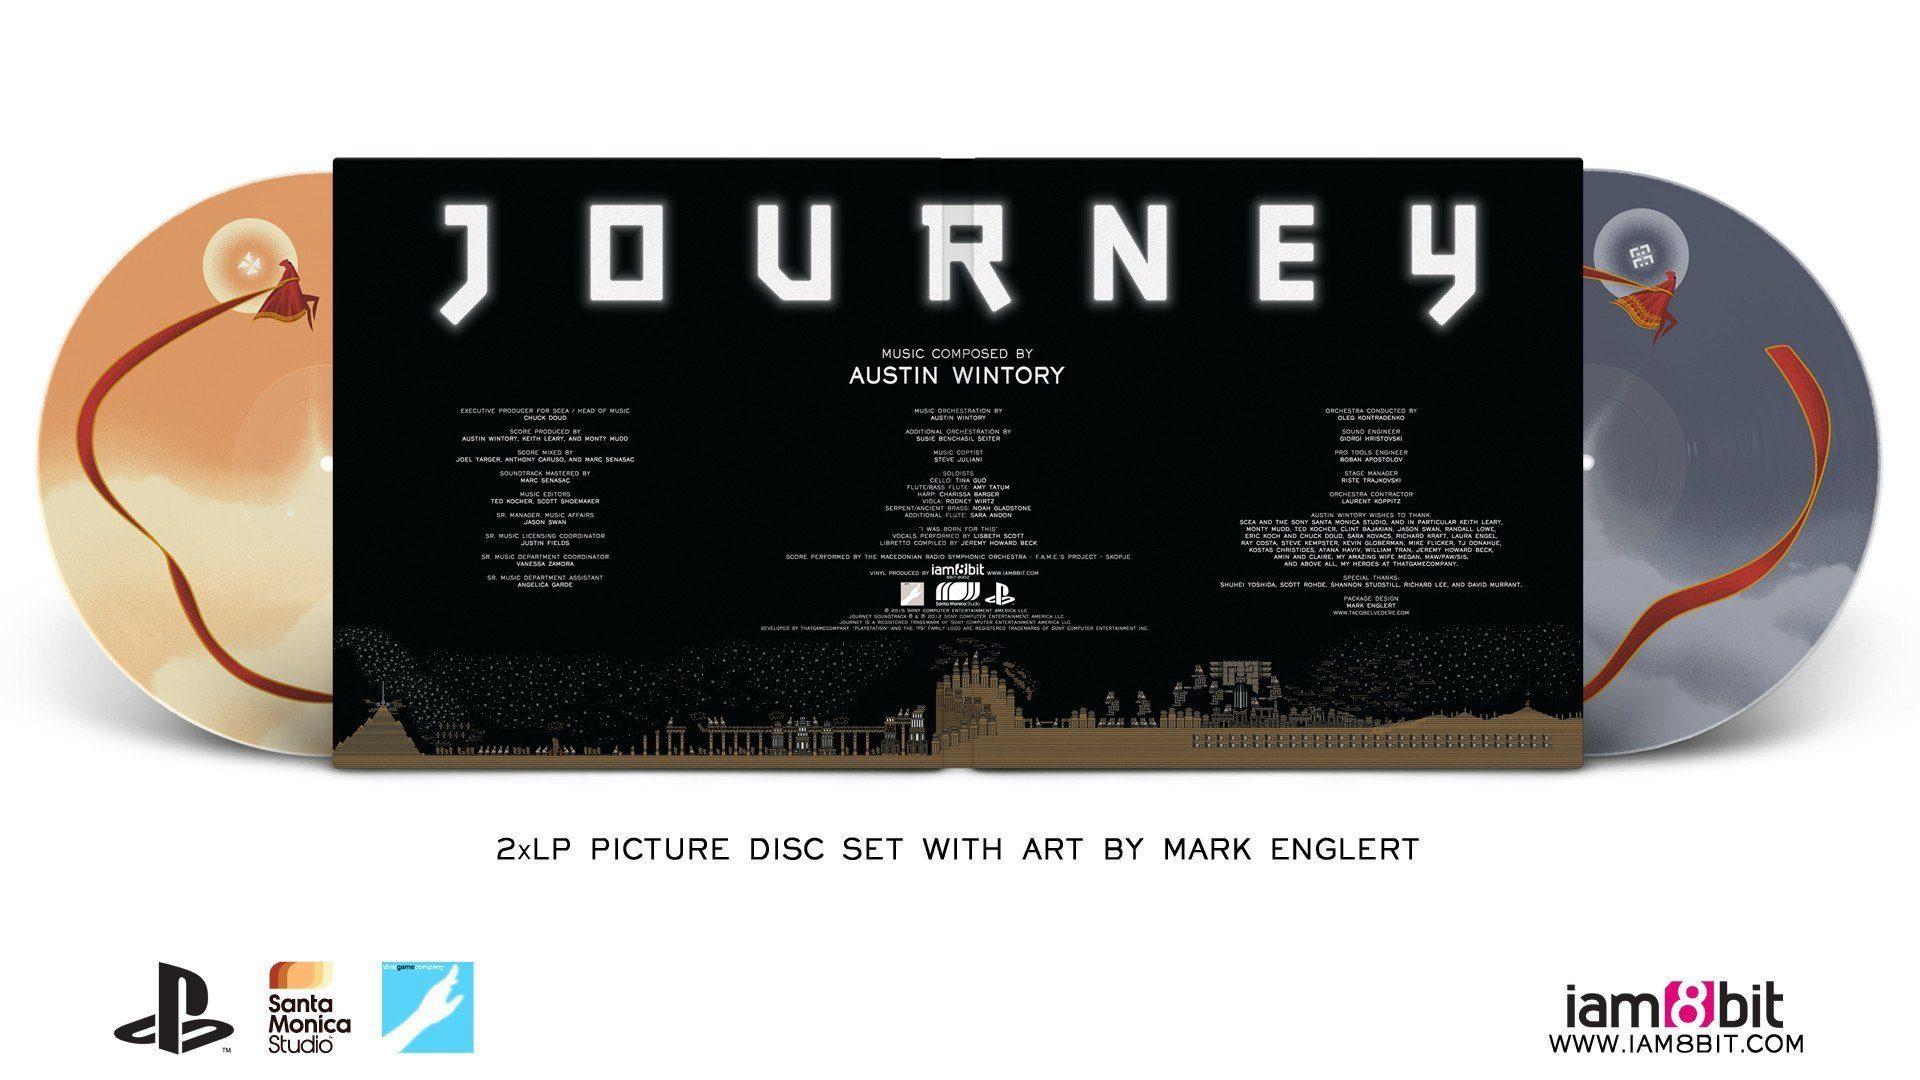 Journey_Web_Gatefold_0693d5cc-f3c9-4d11-a38b-de01afb01f61